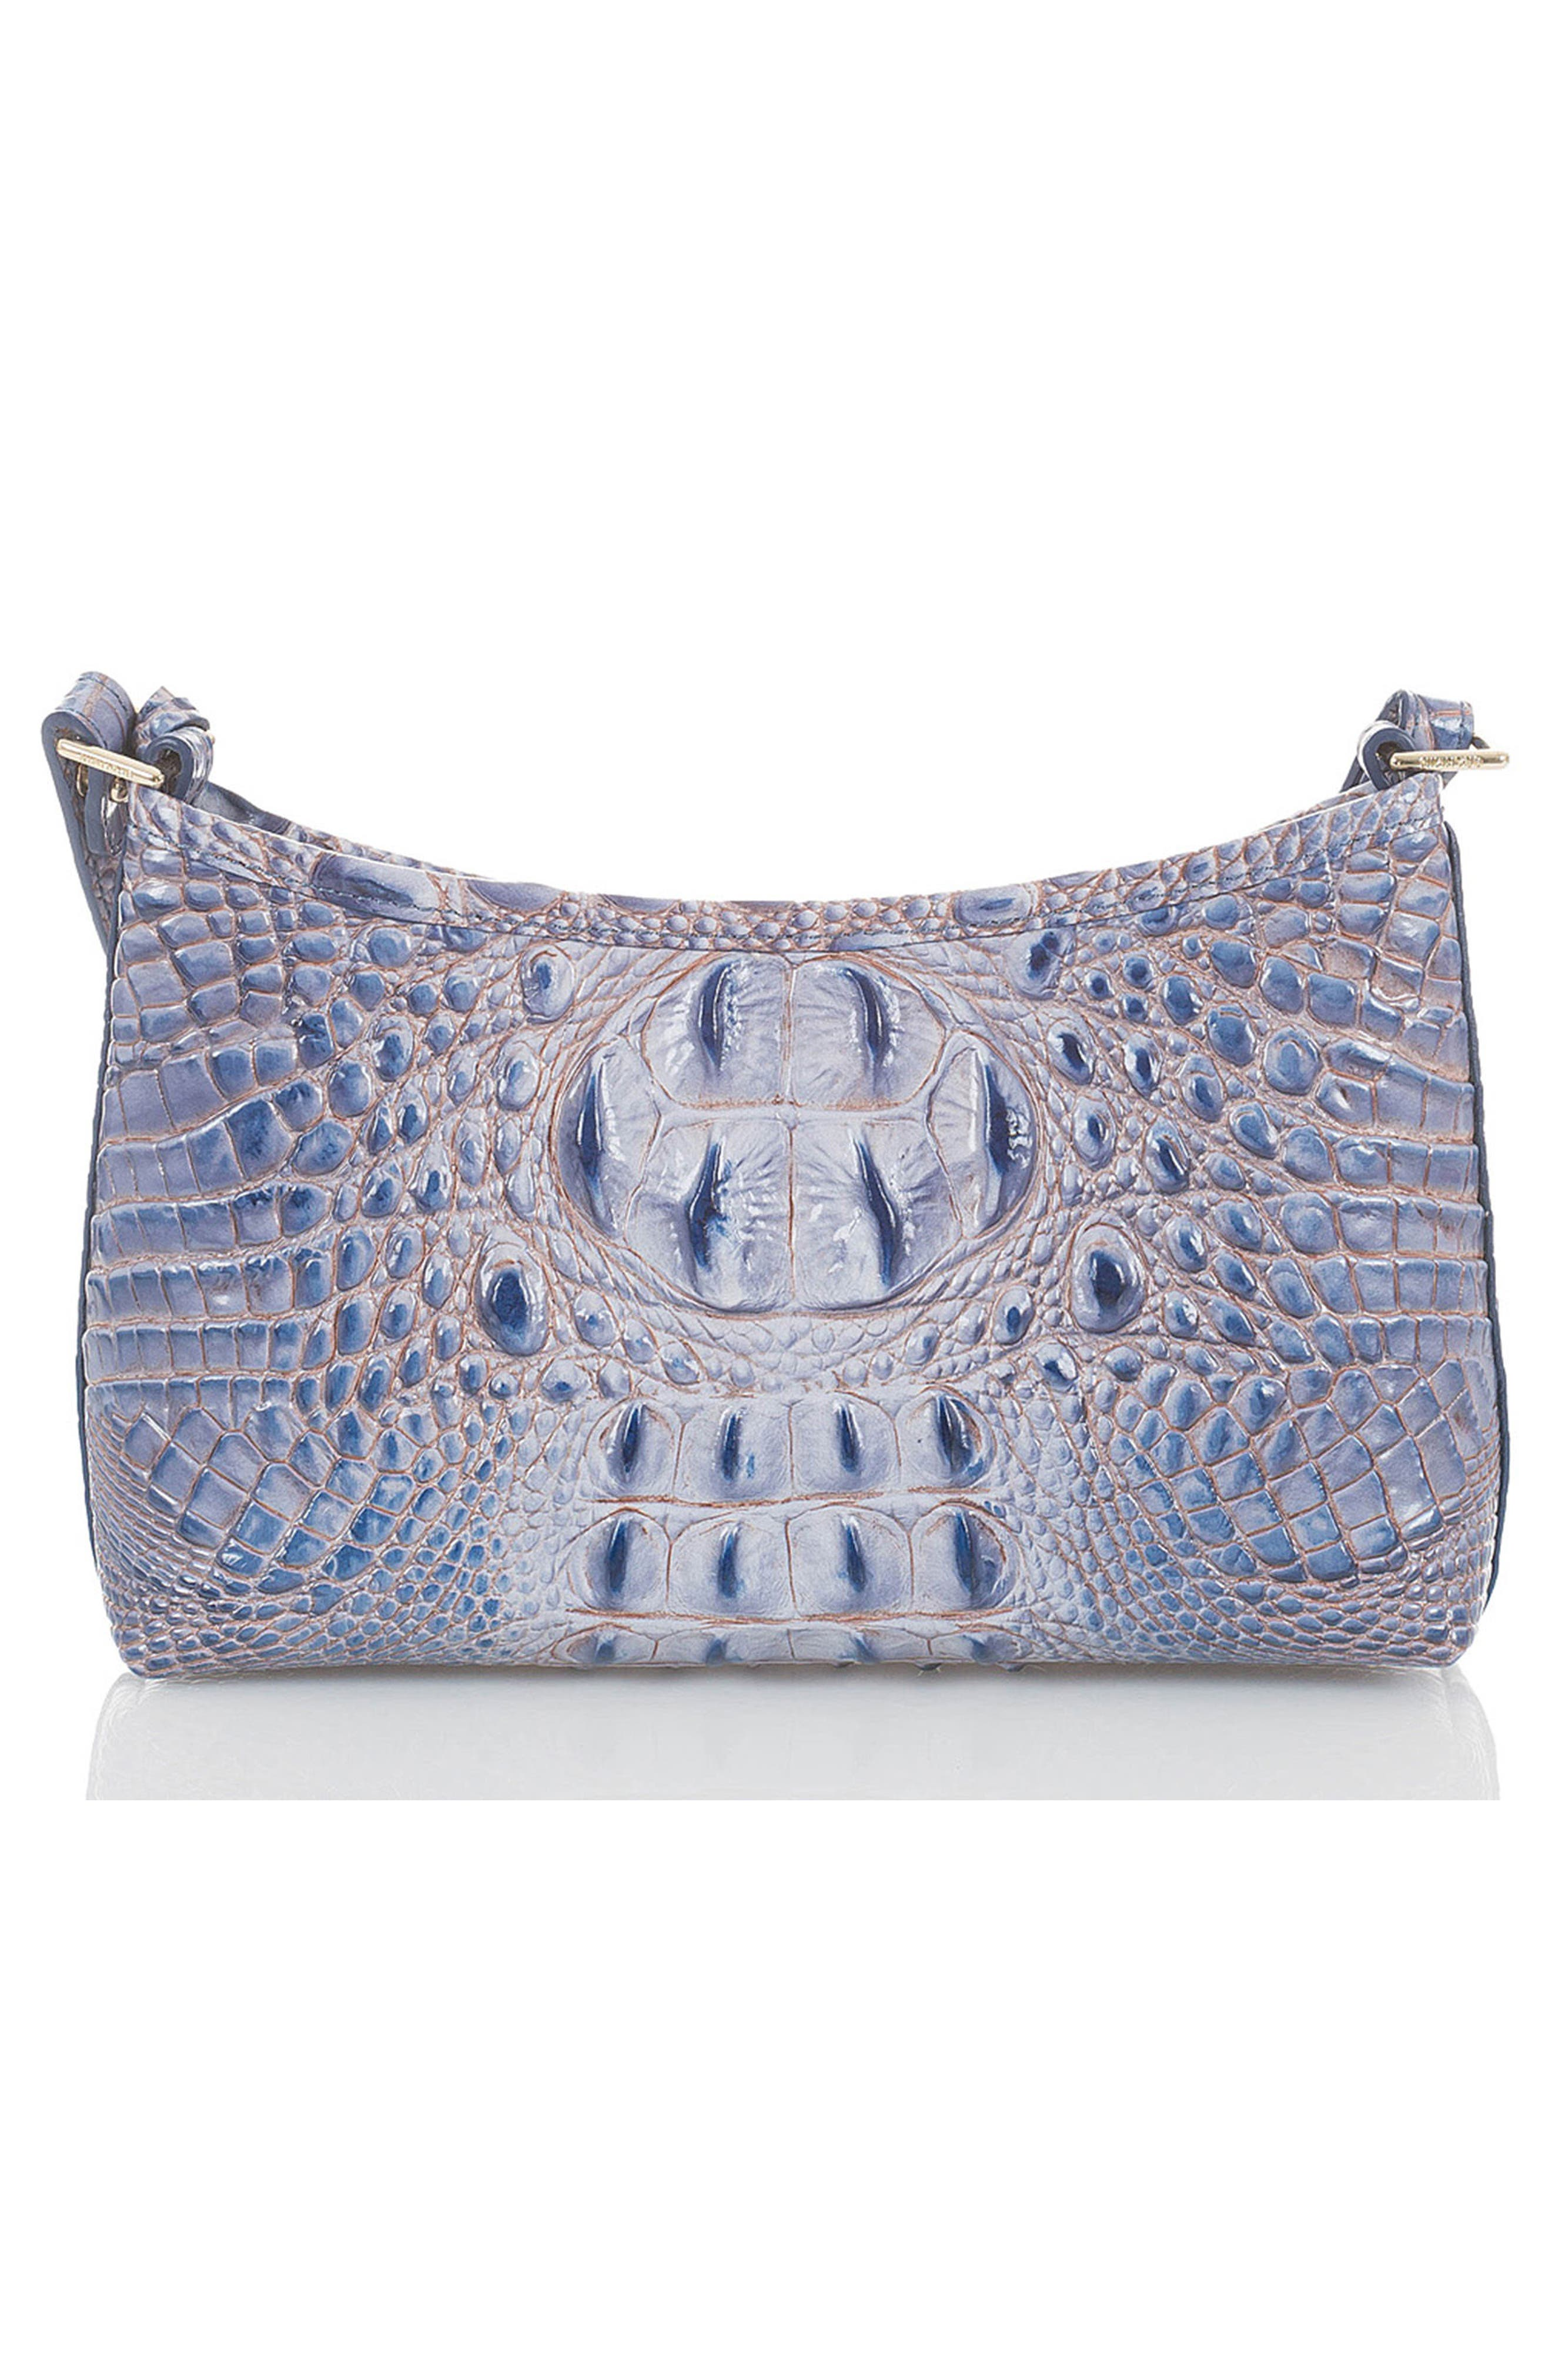 'Anytime - Mini' Convertible Handbag,                             Alternate thumbnail 27, color,